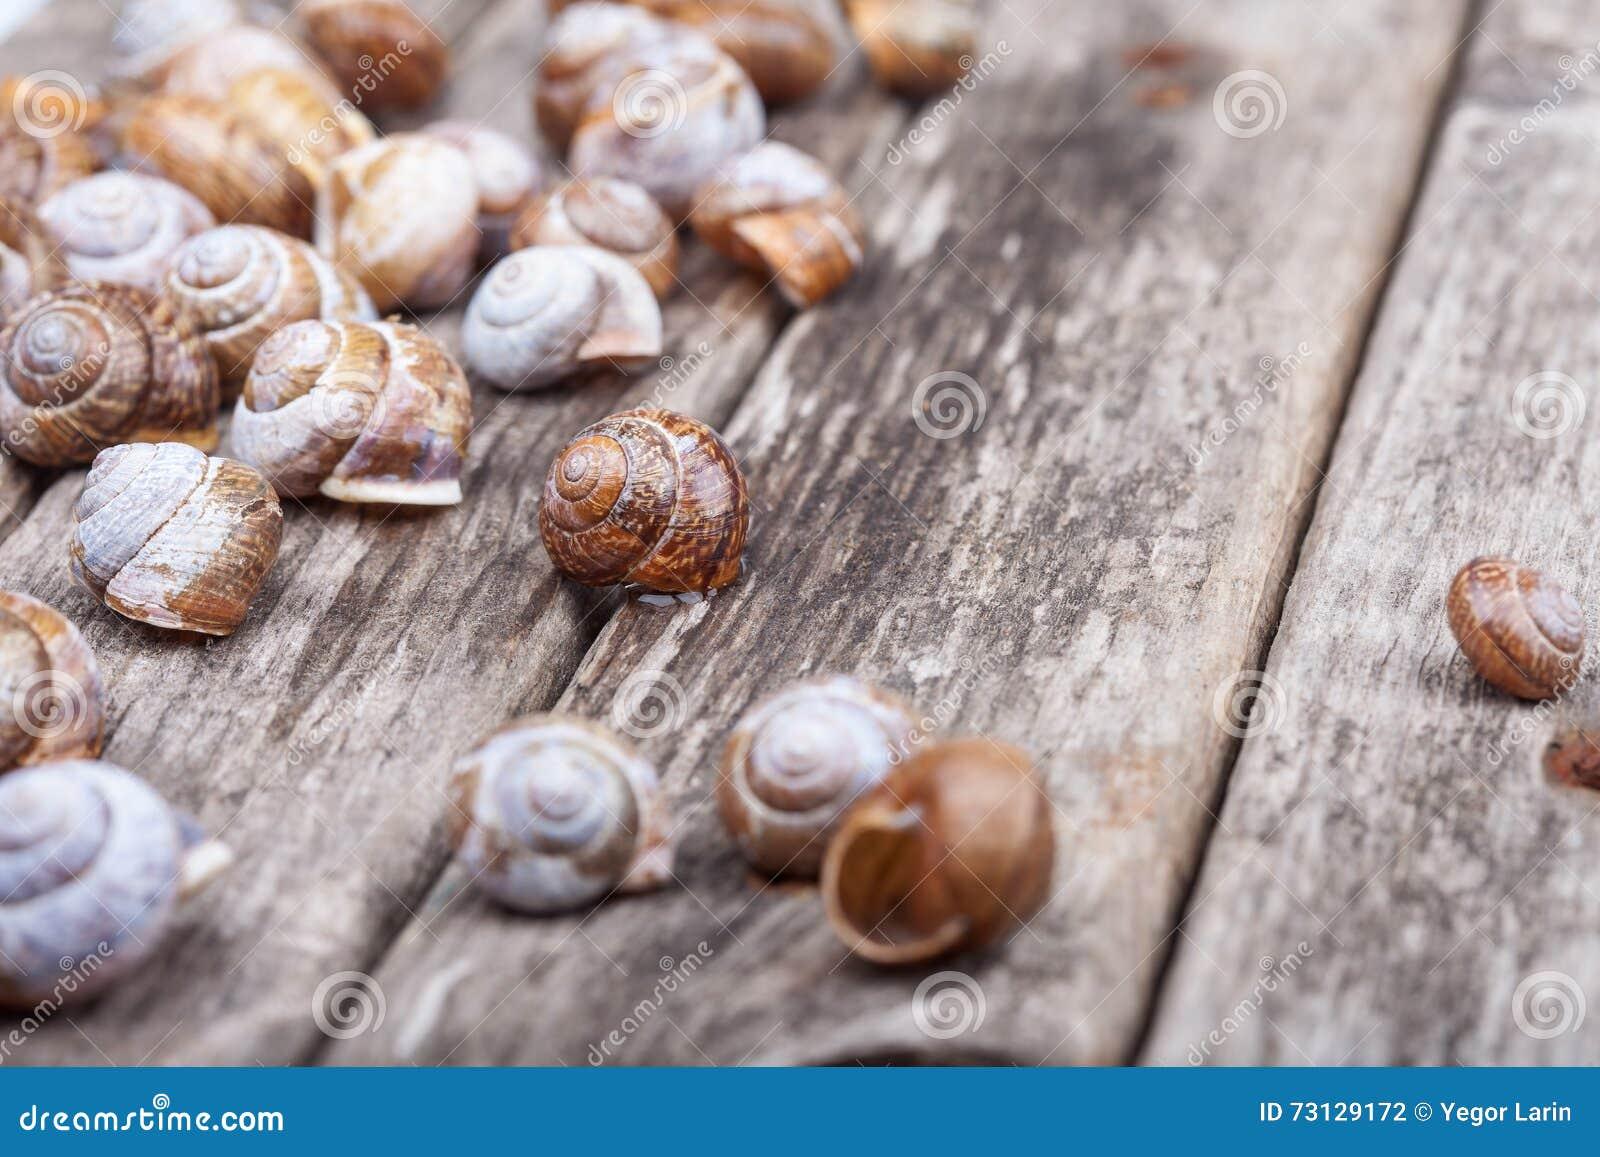 Bunch of brown spiral shells on grunge wooden board